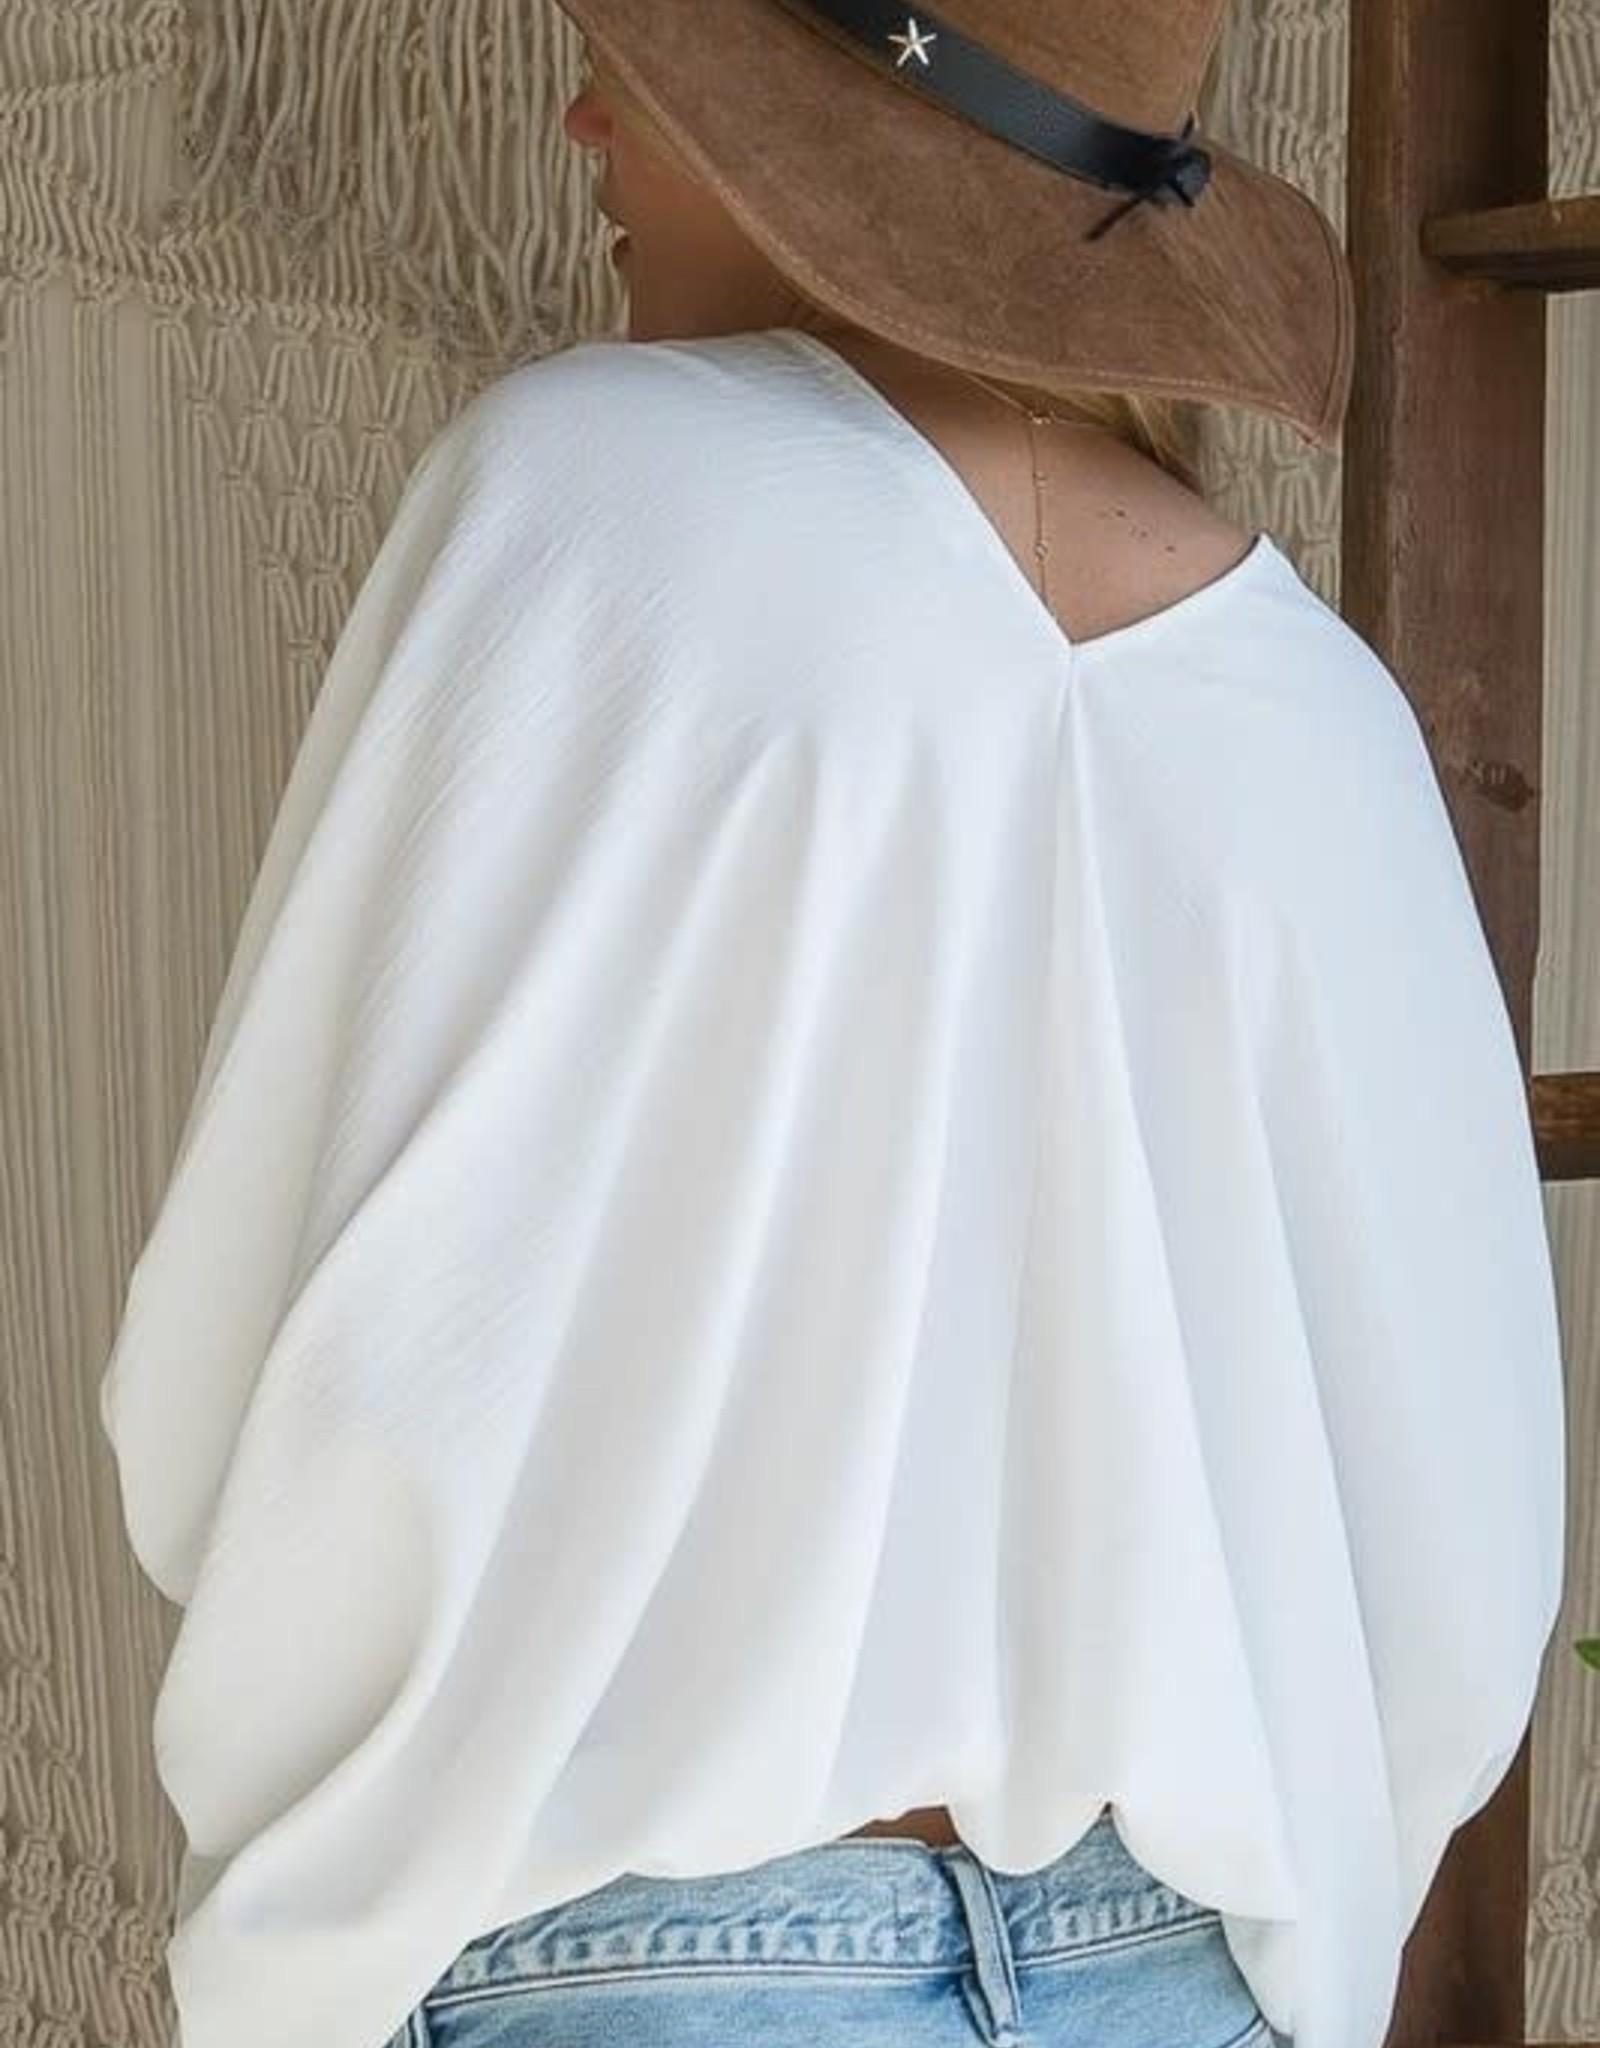 Bucketlist White V-Neck Dolman Sleeve Top